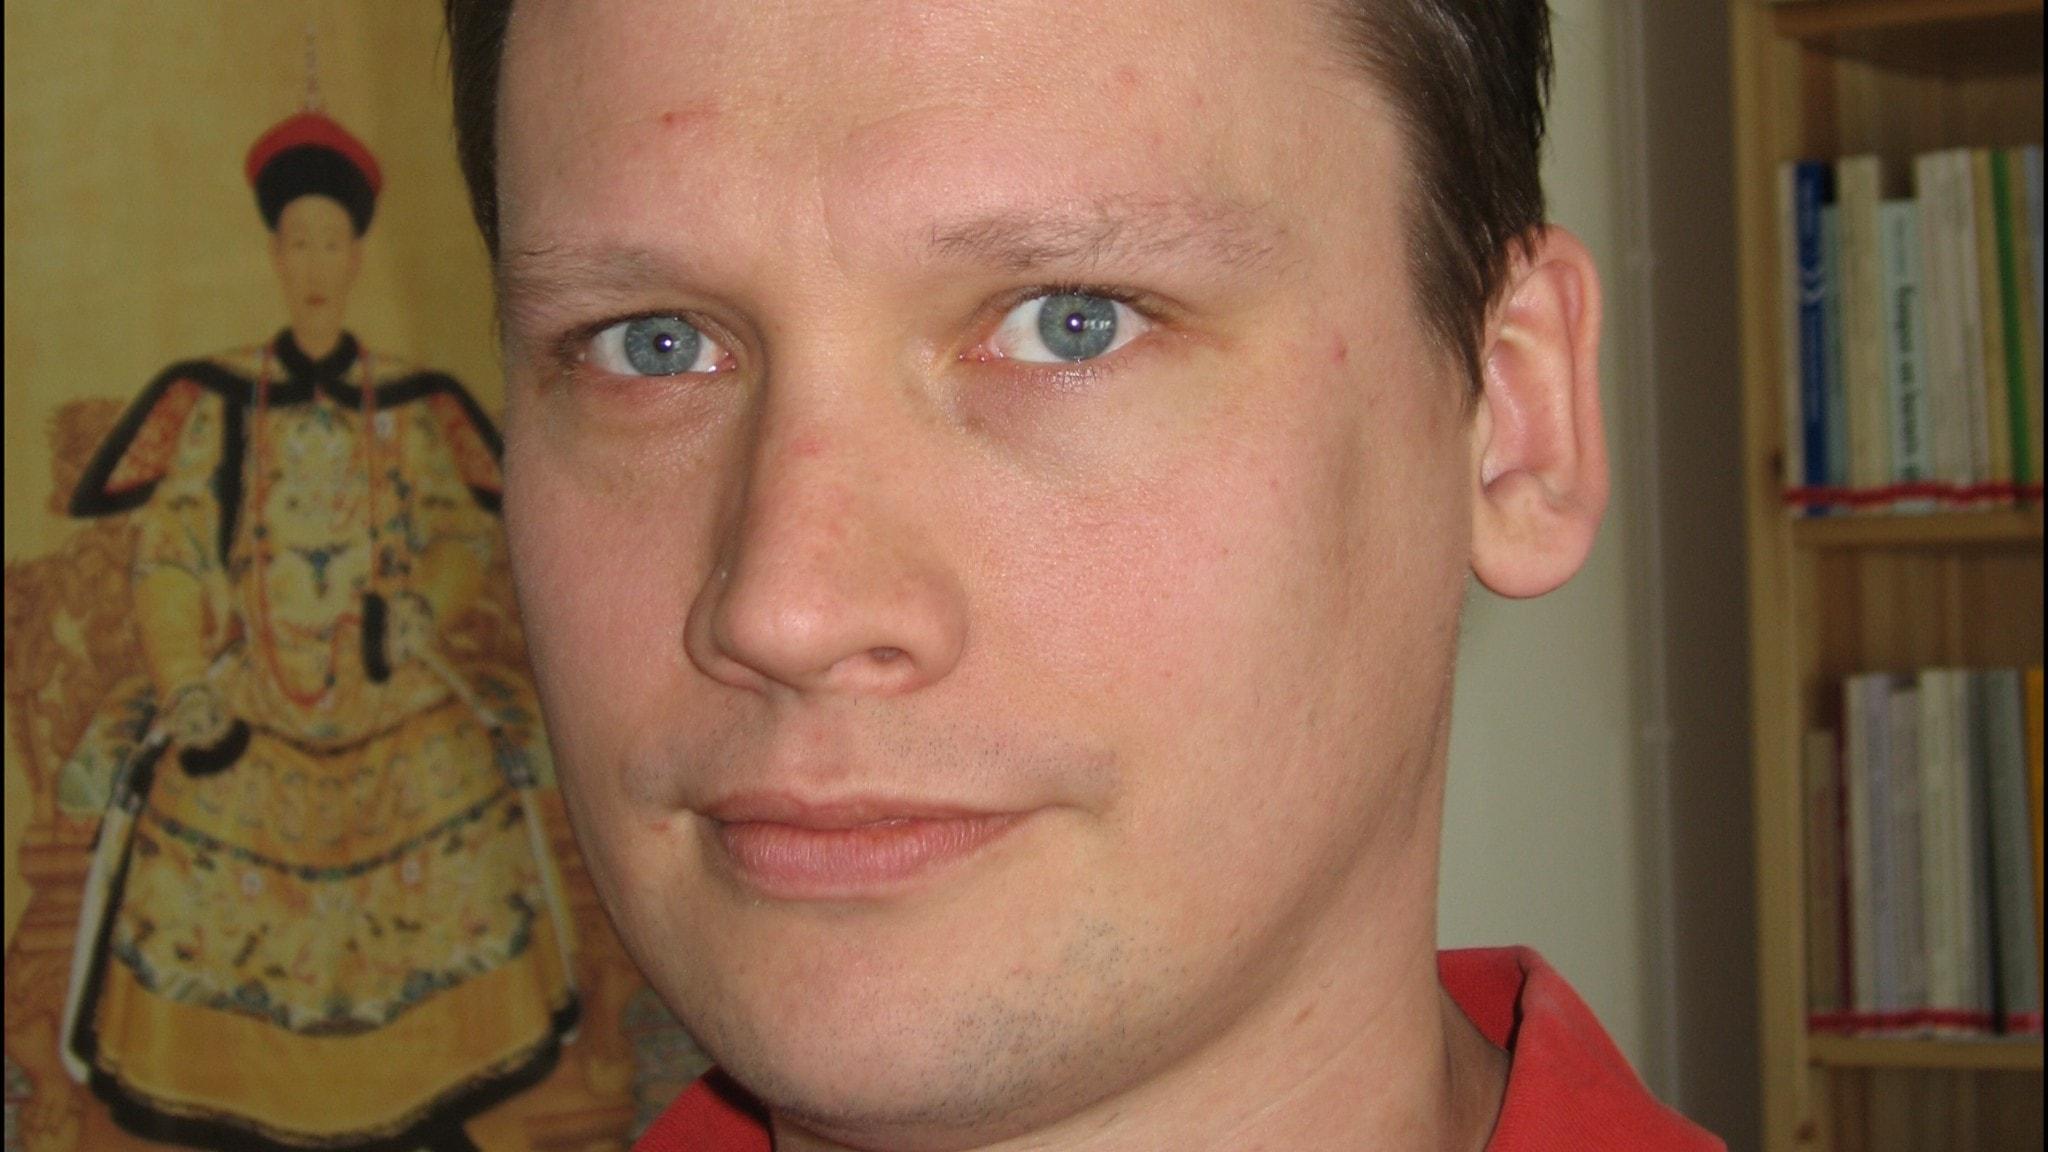 Fredrik Liljeros